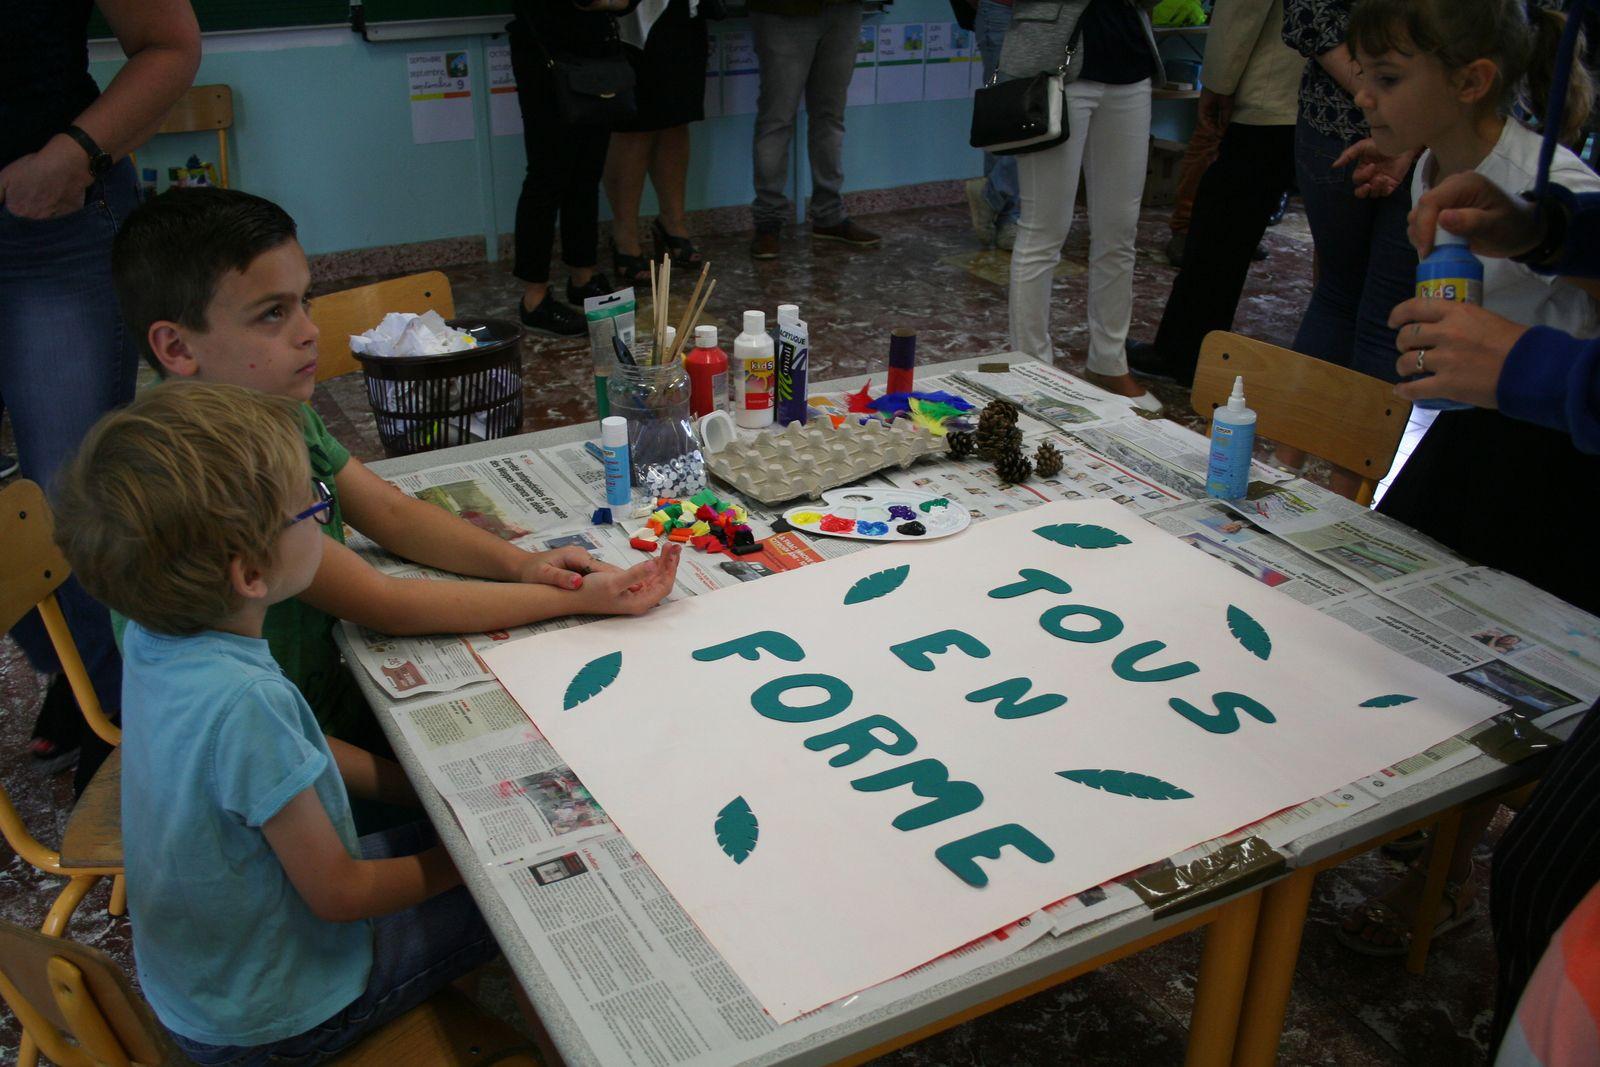 CENTRE LAKANAL-JEUX OLYMPIQUES-YOGA-ARTS PLASTIQUES-VENDREDI 24 JUILLET 2020